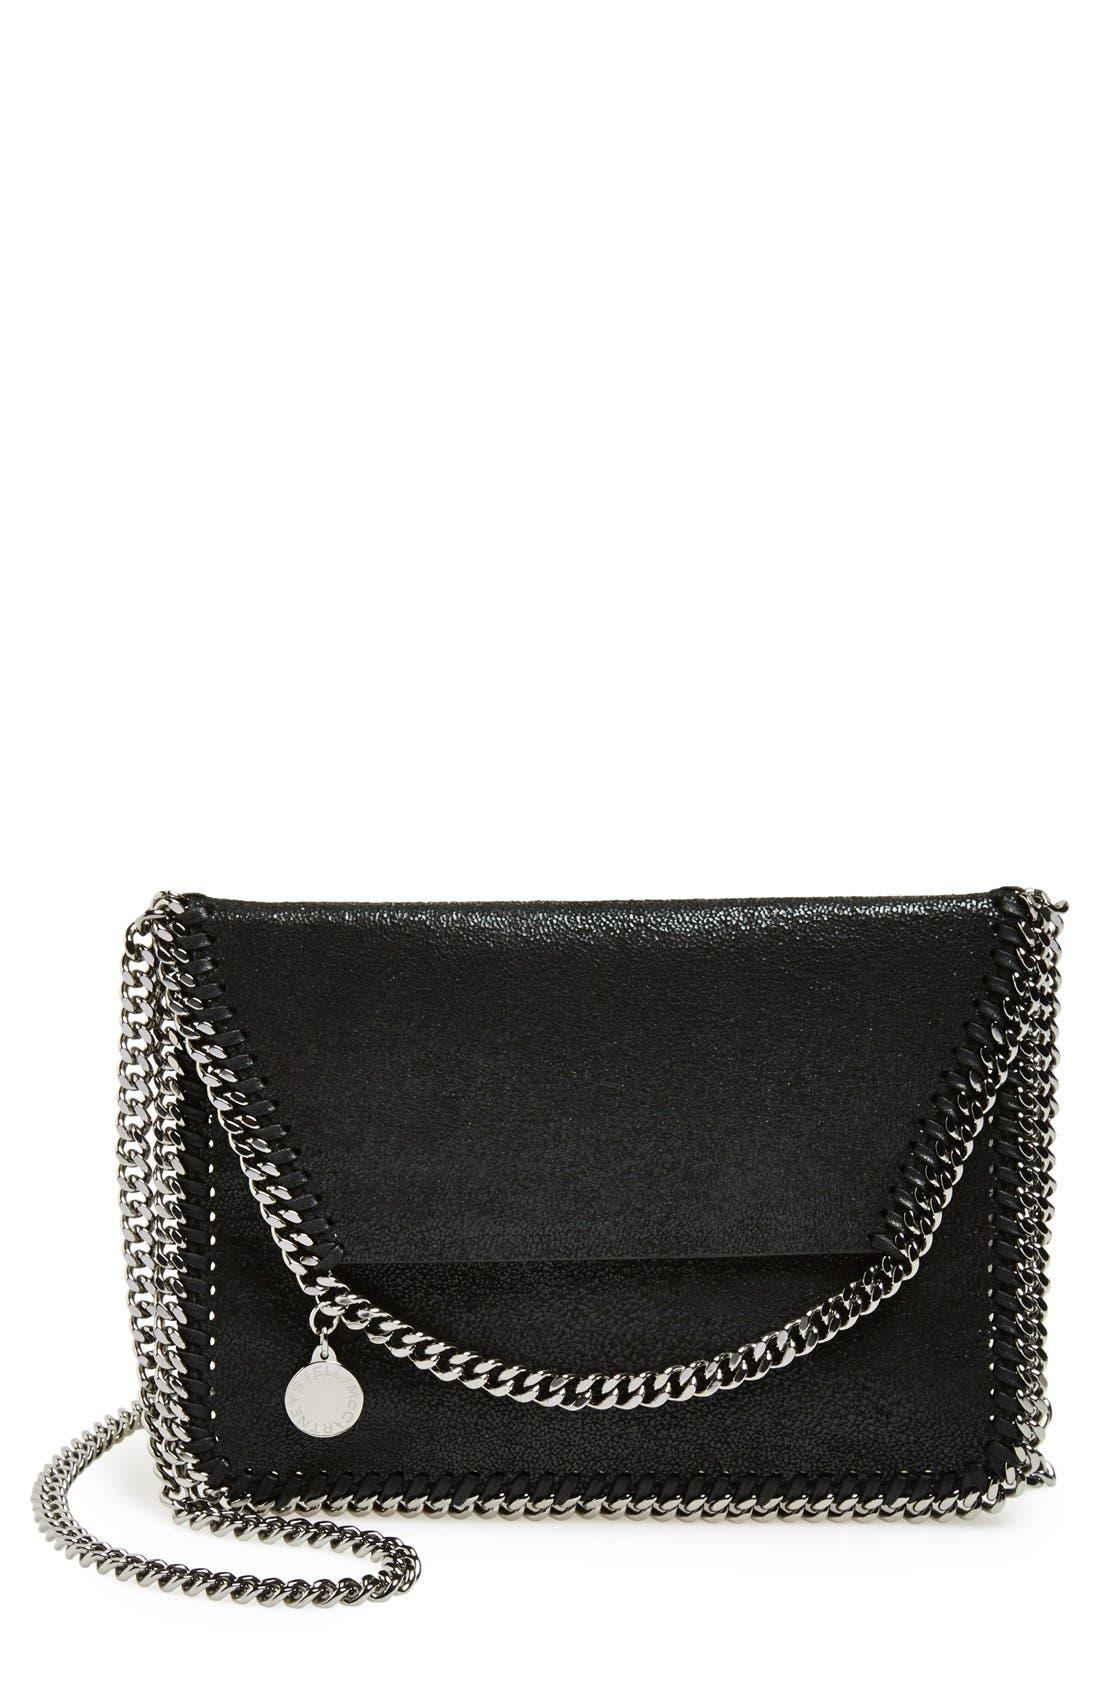 Stella McCartney Shoulder Bag for Women On Sale, Black, Eco Leather, 2017, one size